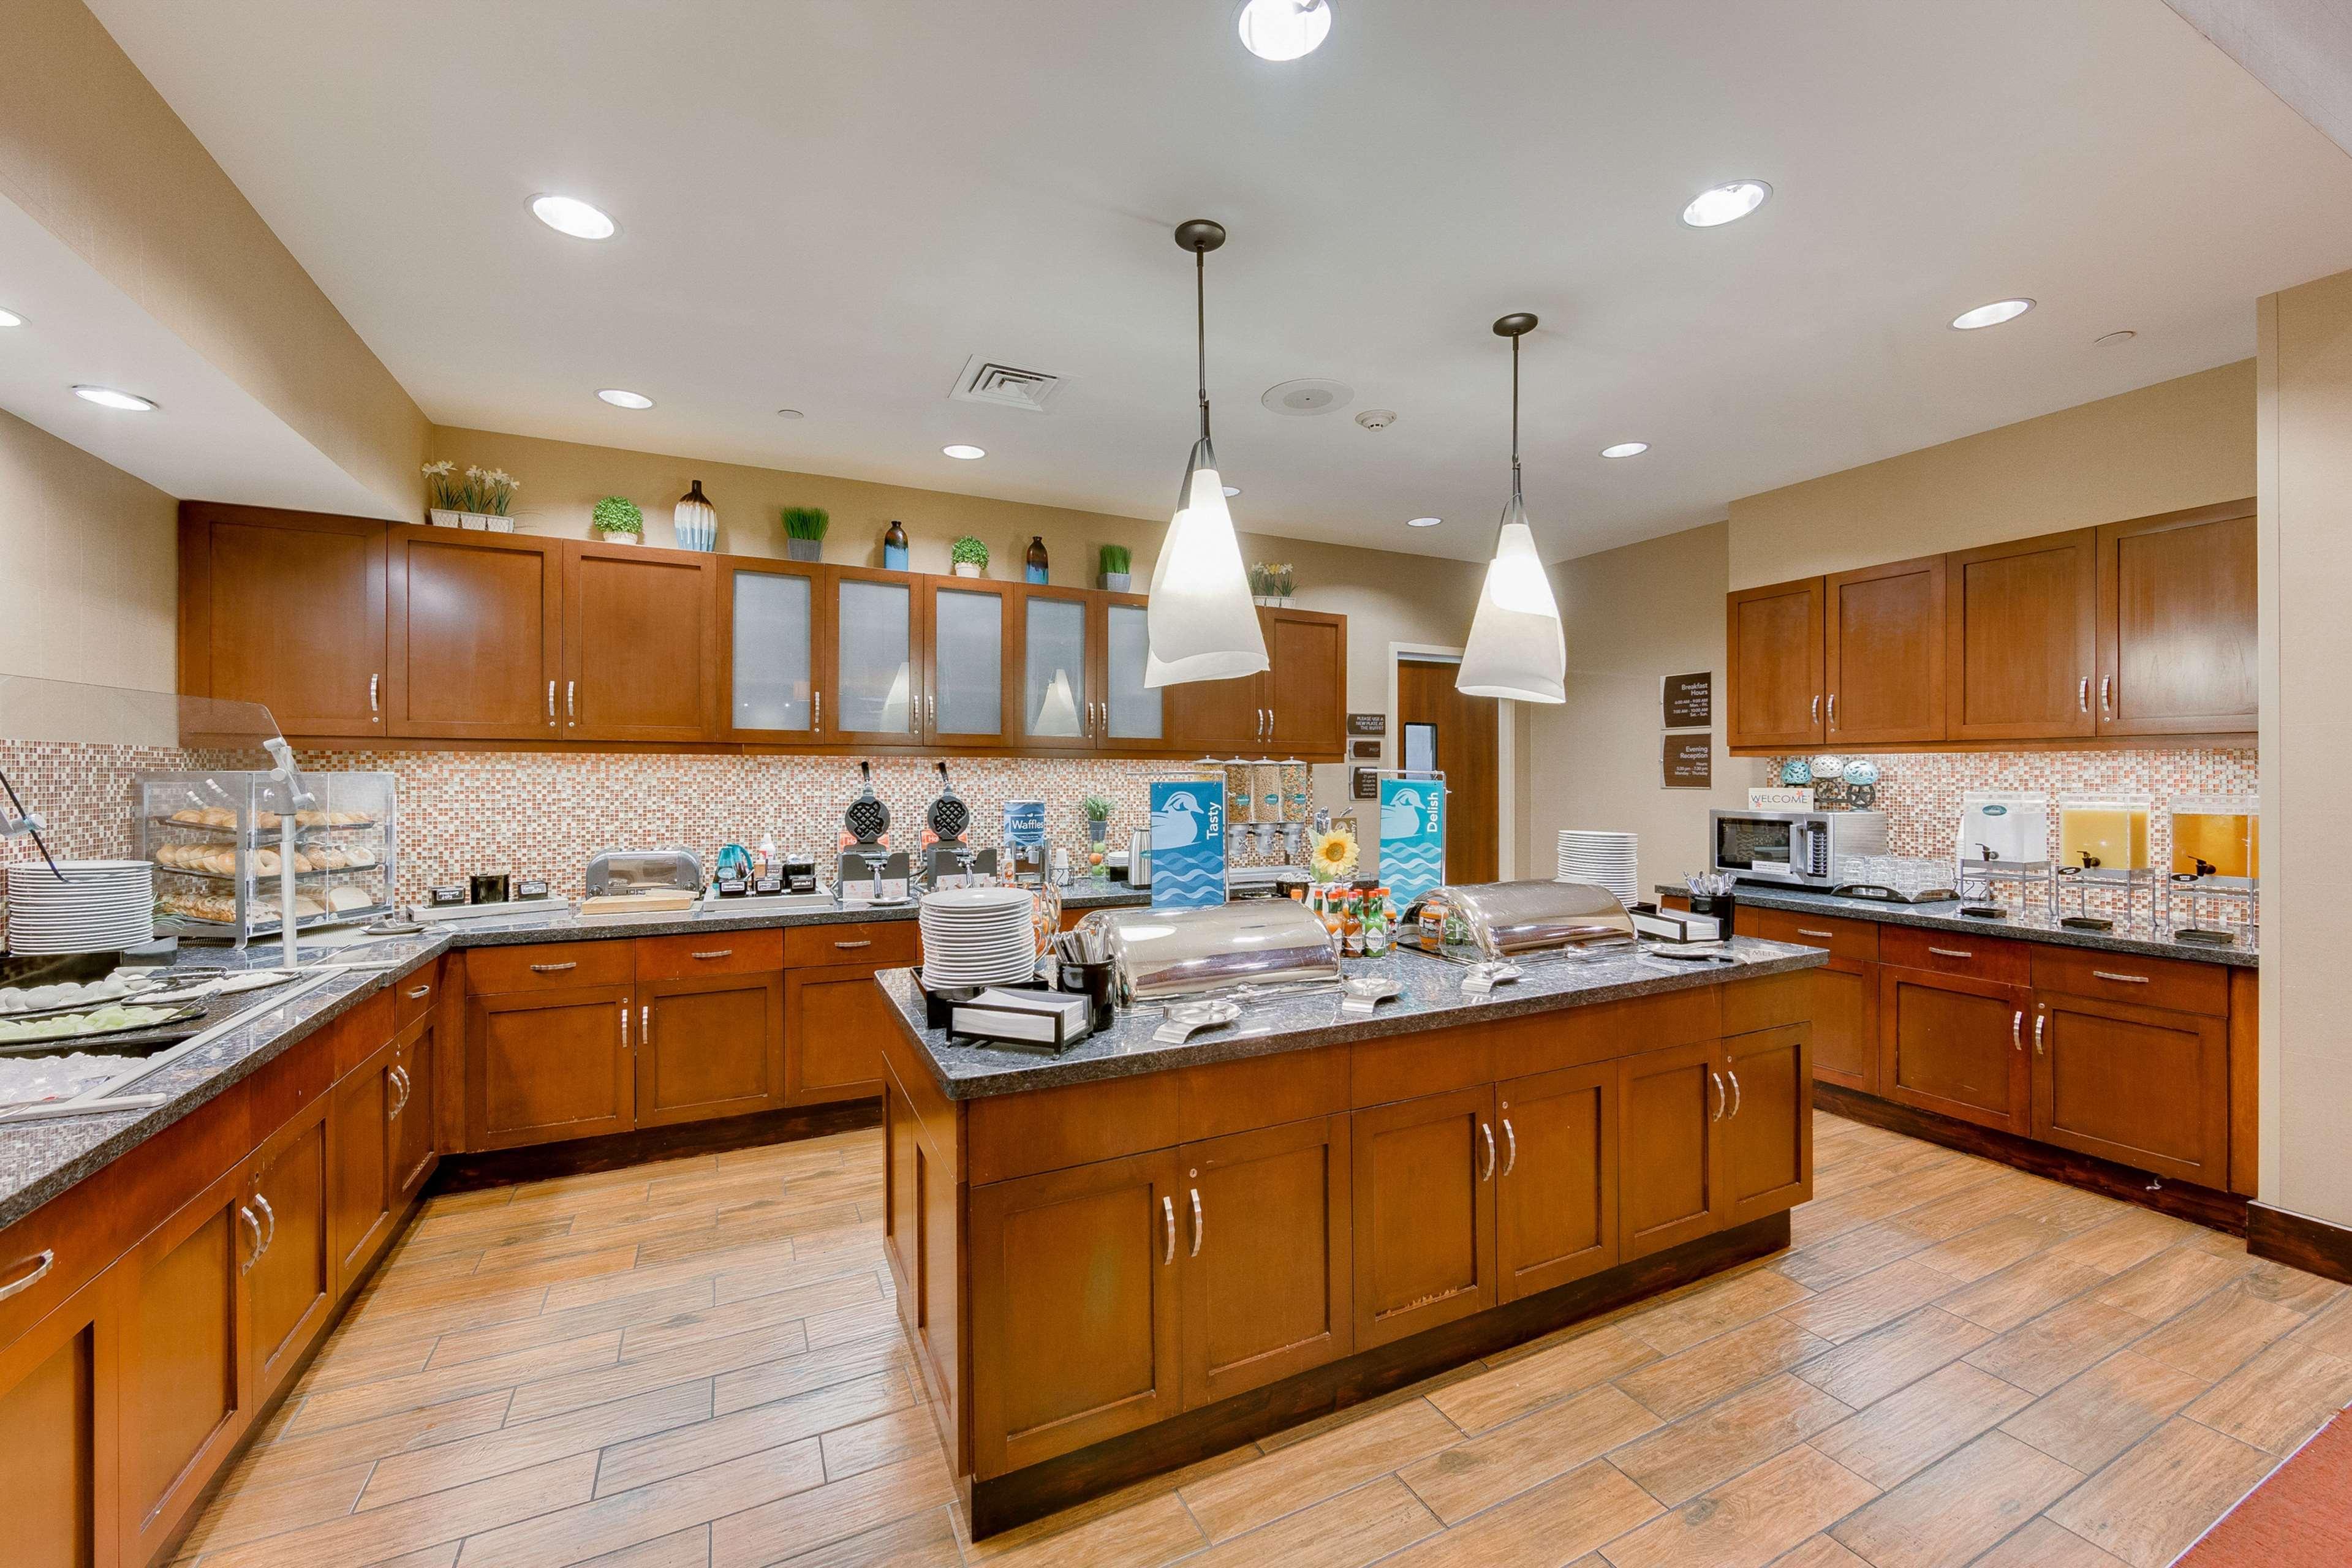 Homewood Suites by Hilton Fort Worth - Medical Center, TX image 7